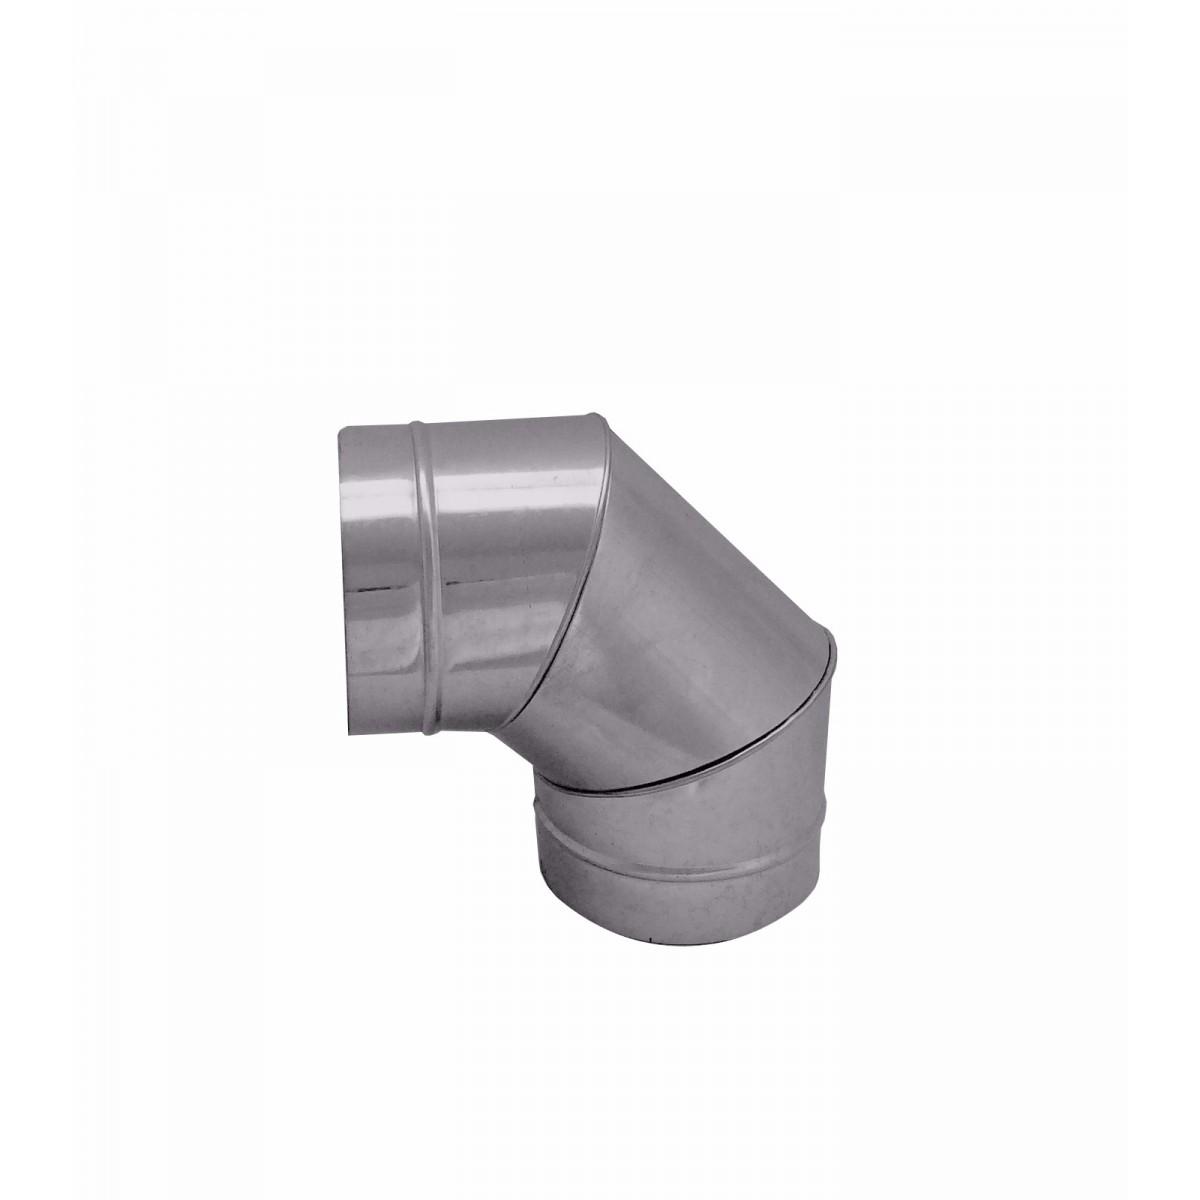 Curva / cotovelo galvanizada 90° de 115 mm de diâmetro  - Galvocalhas